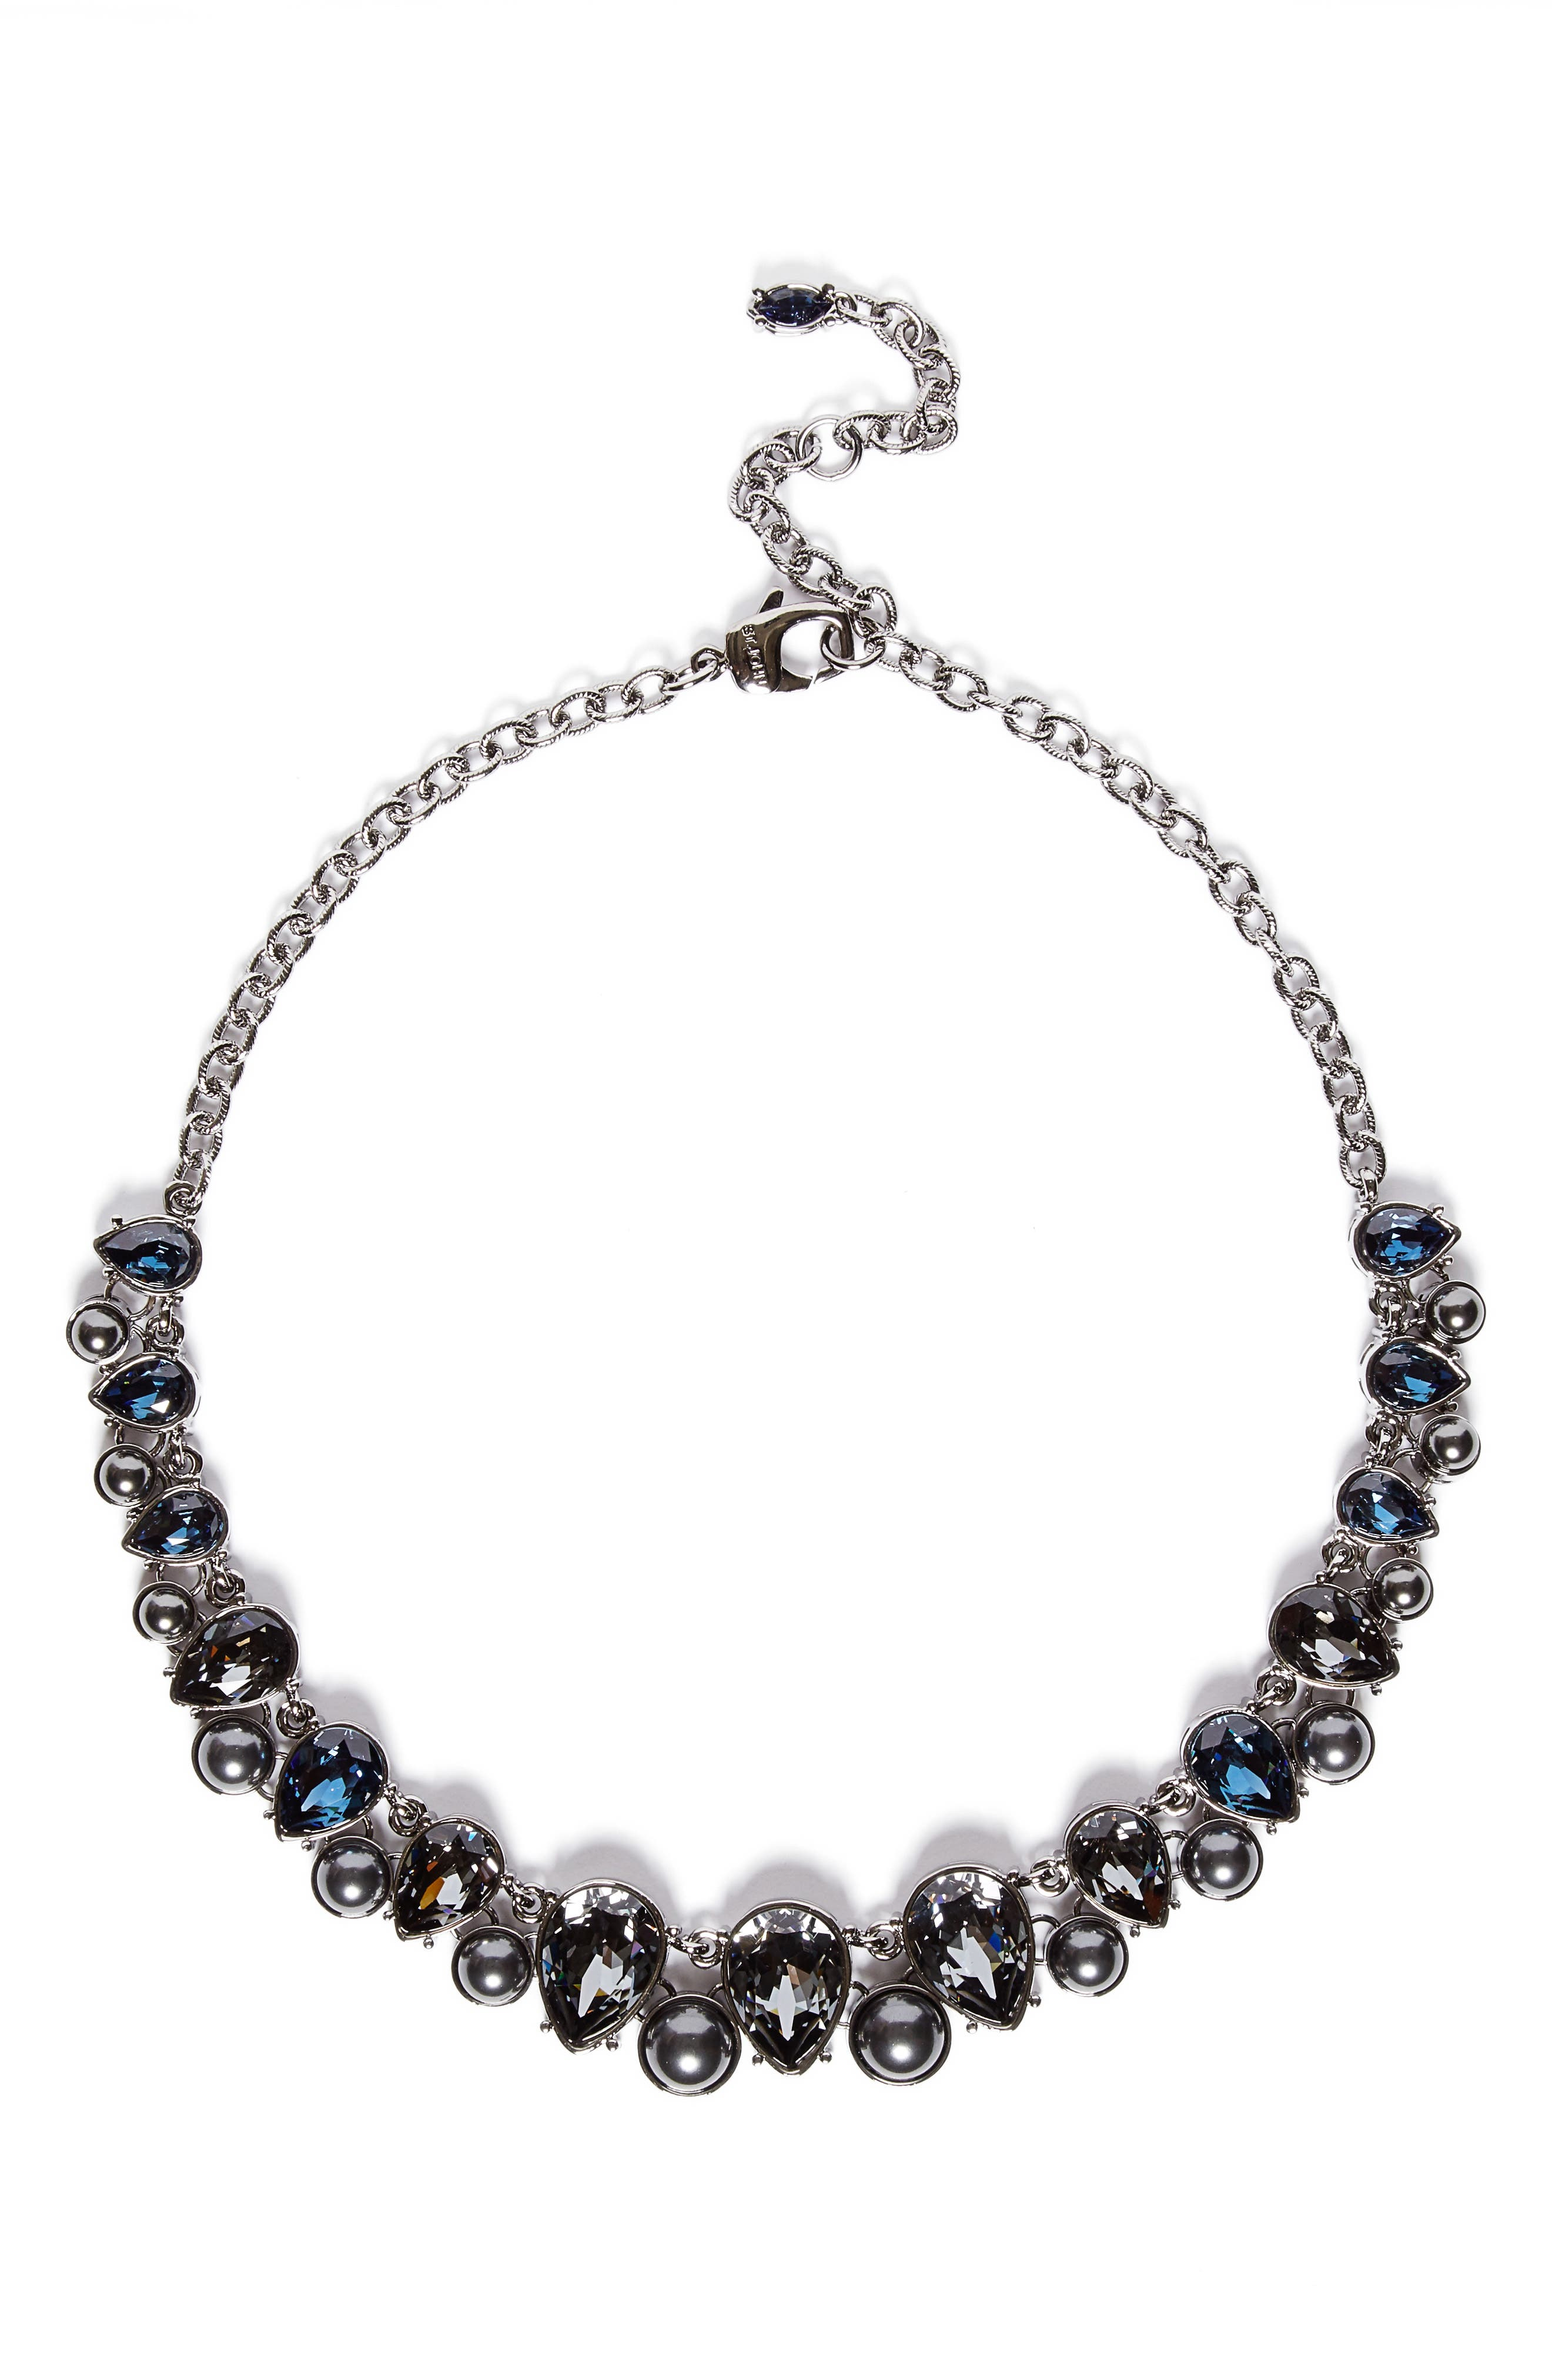 Swarovski Crystal & Imitation Pearl Necklace,                         Main,                         color, 040